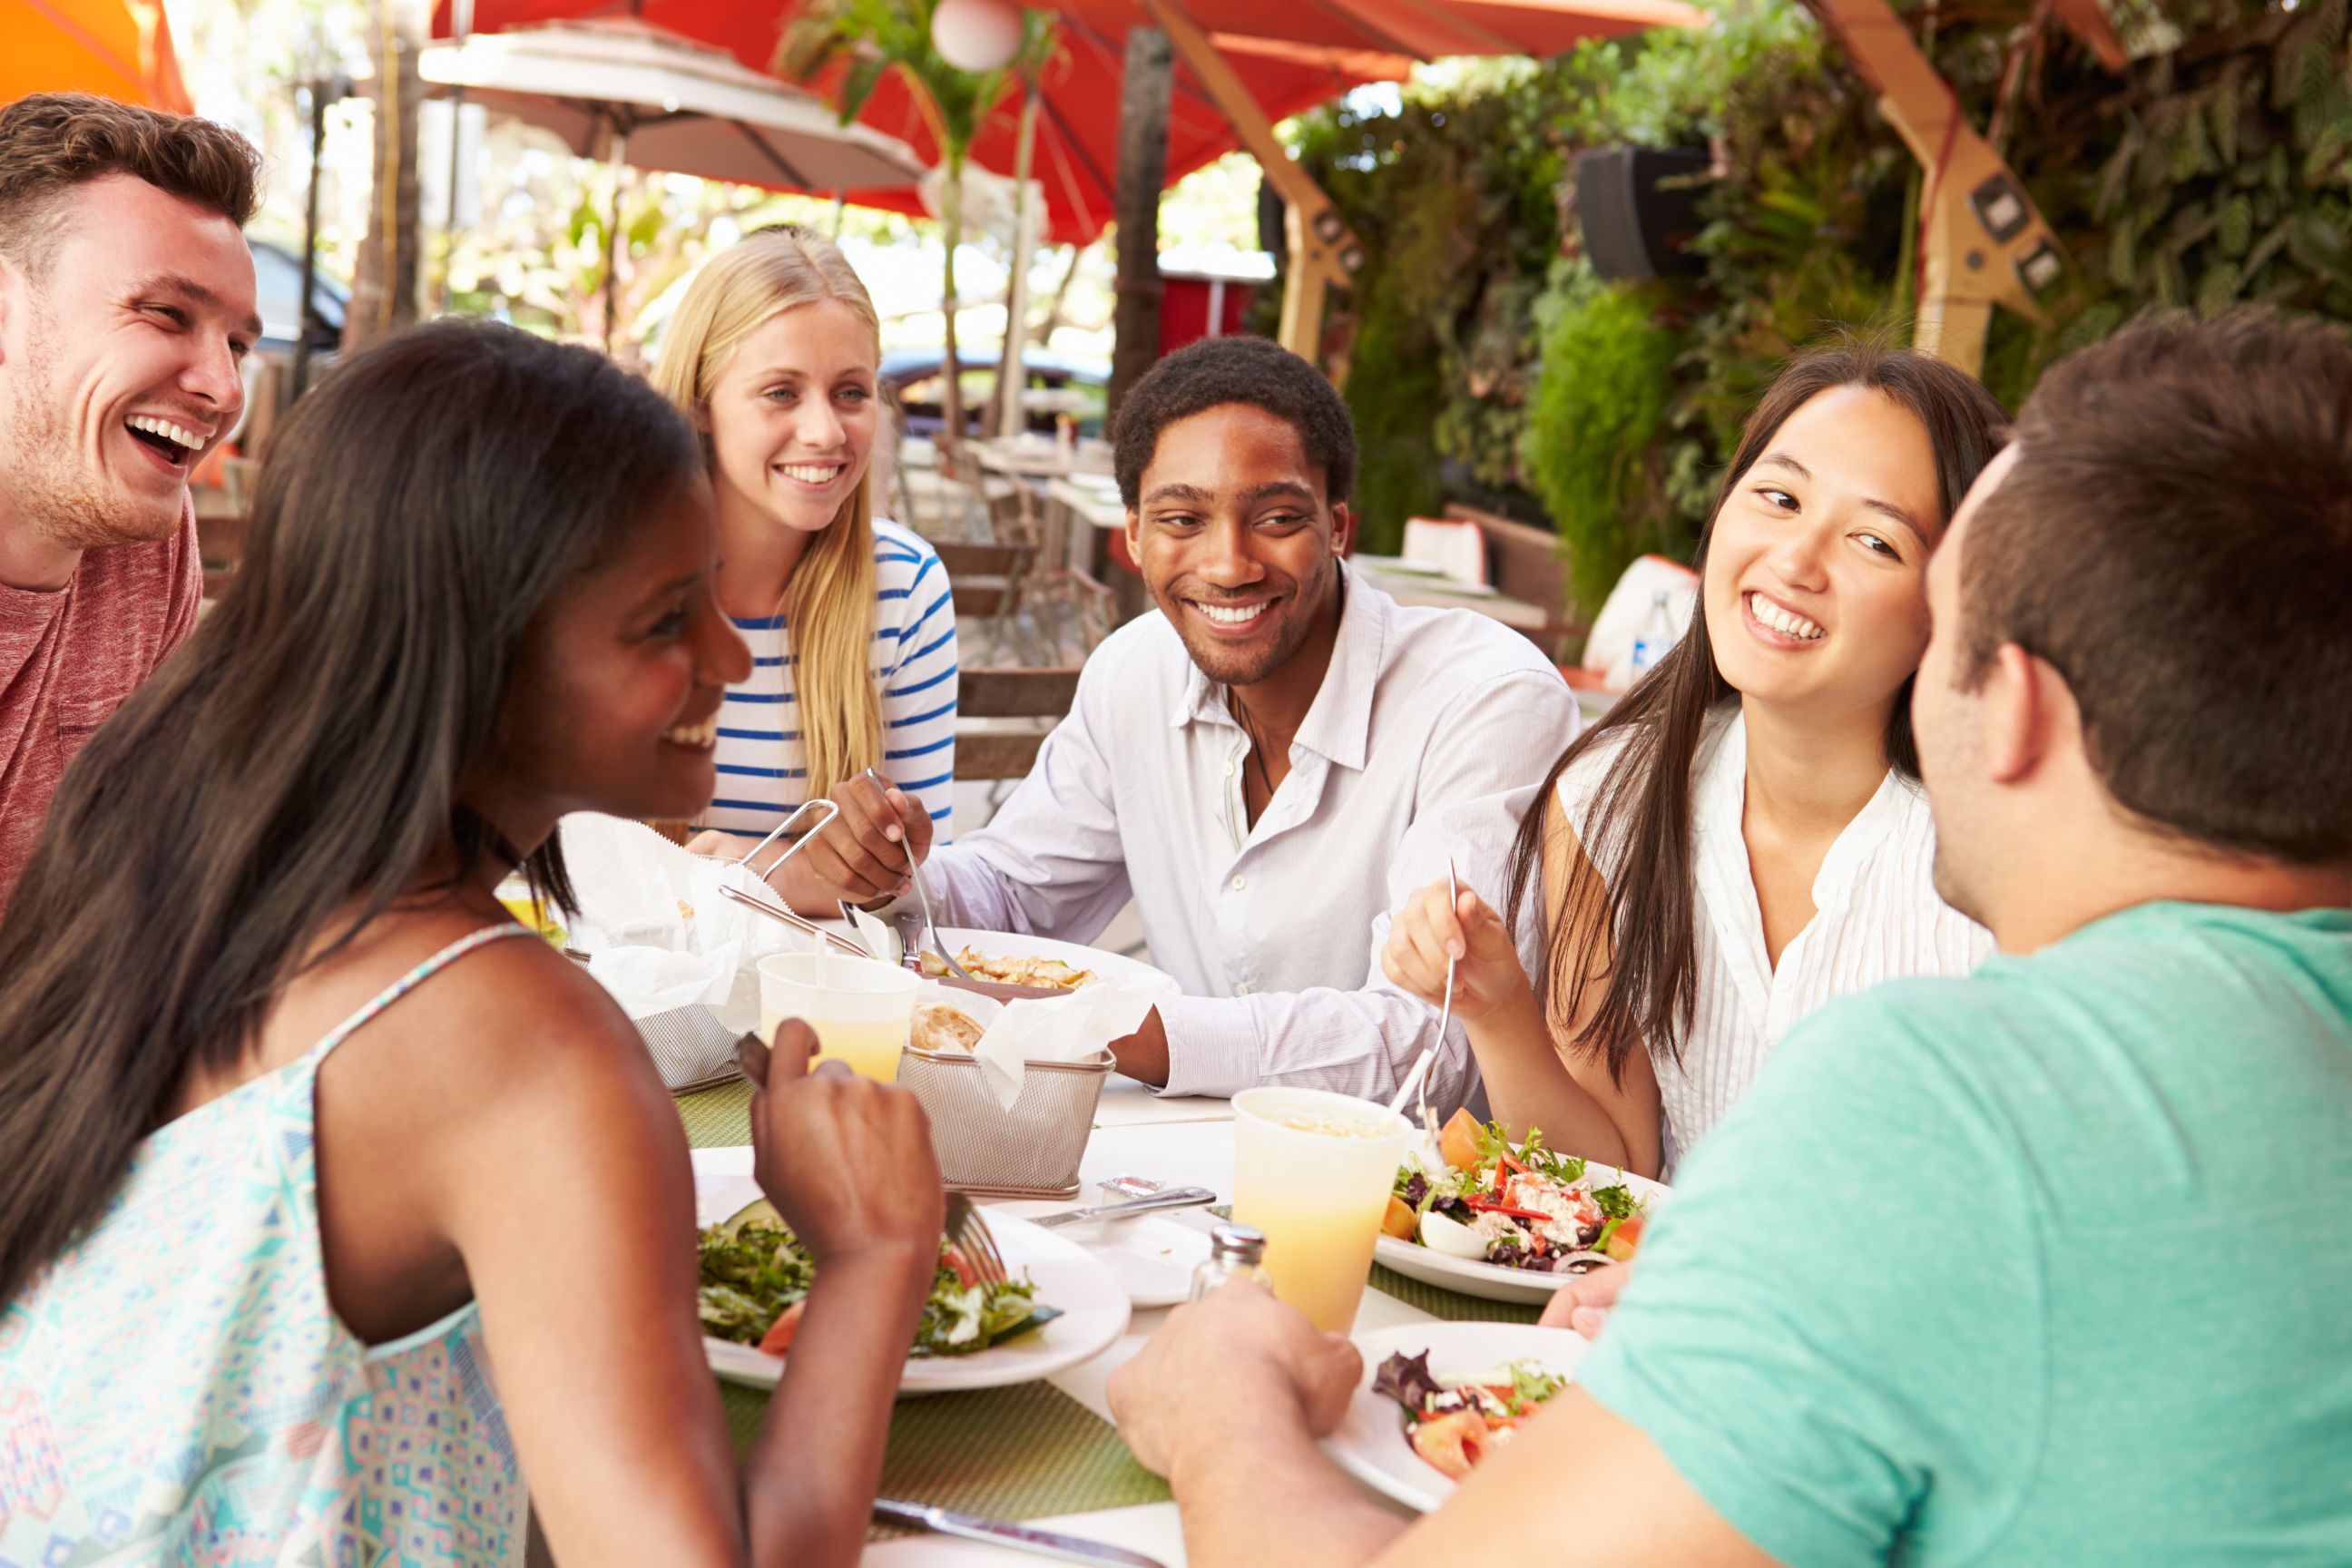 Restaurant - Ethnic